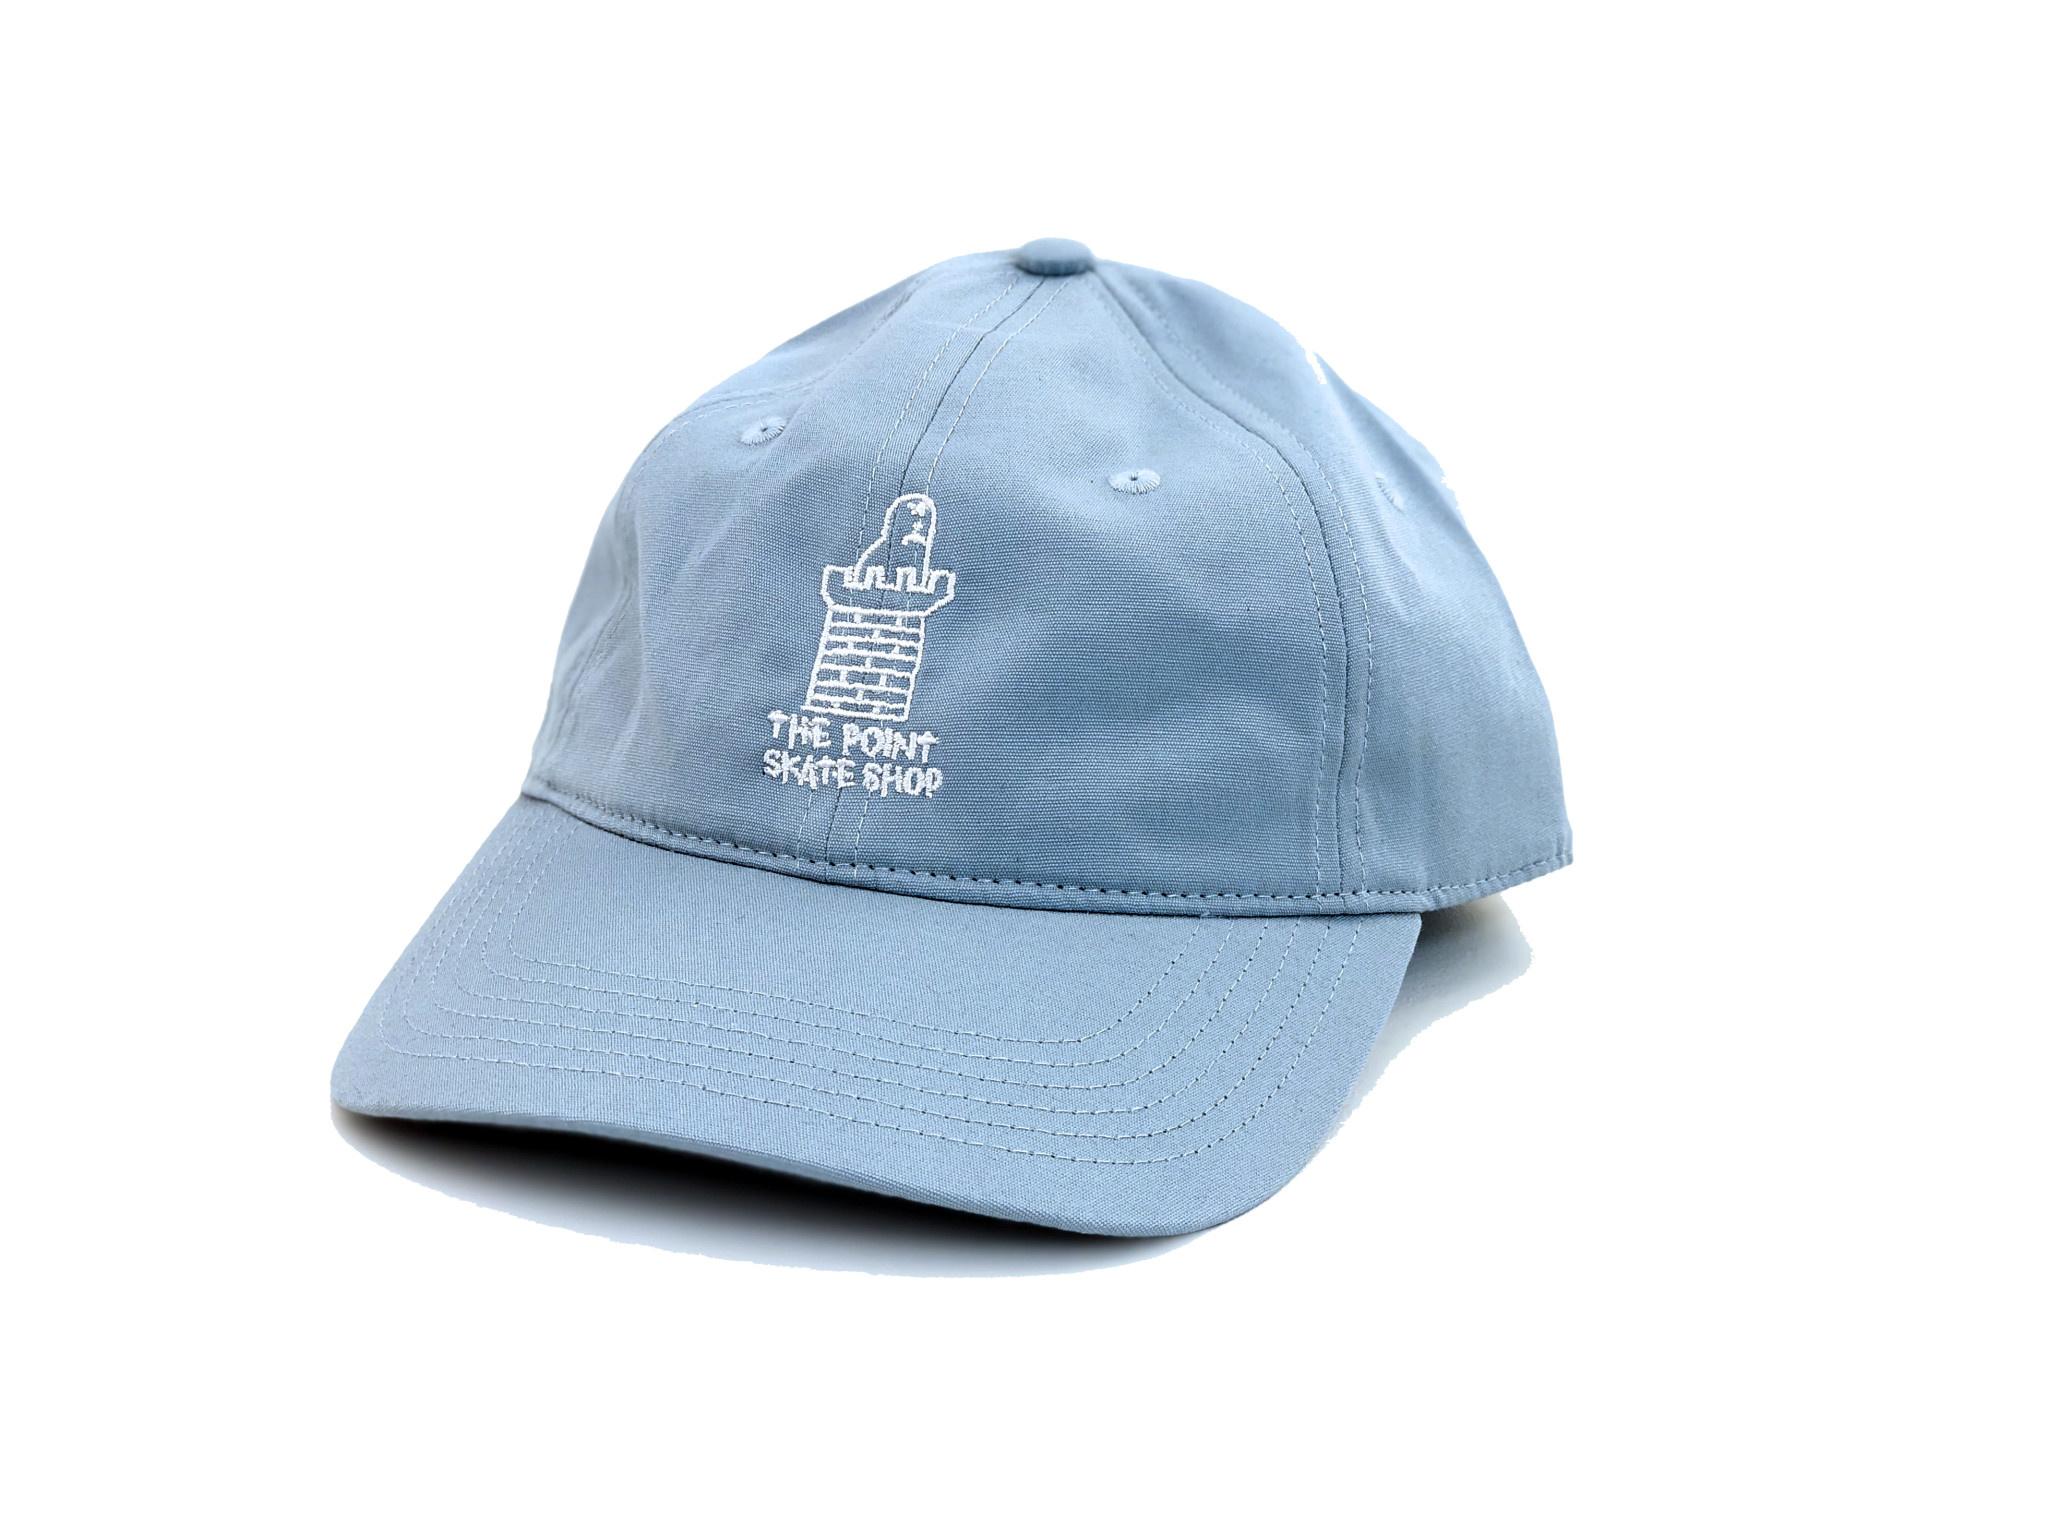 The Point The Point - Gonz Davie Baby Blue Hat